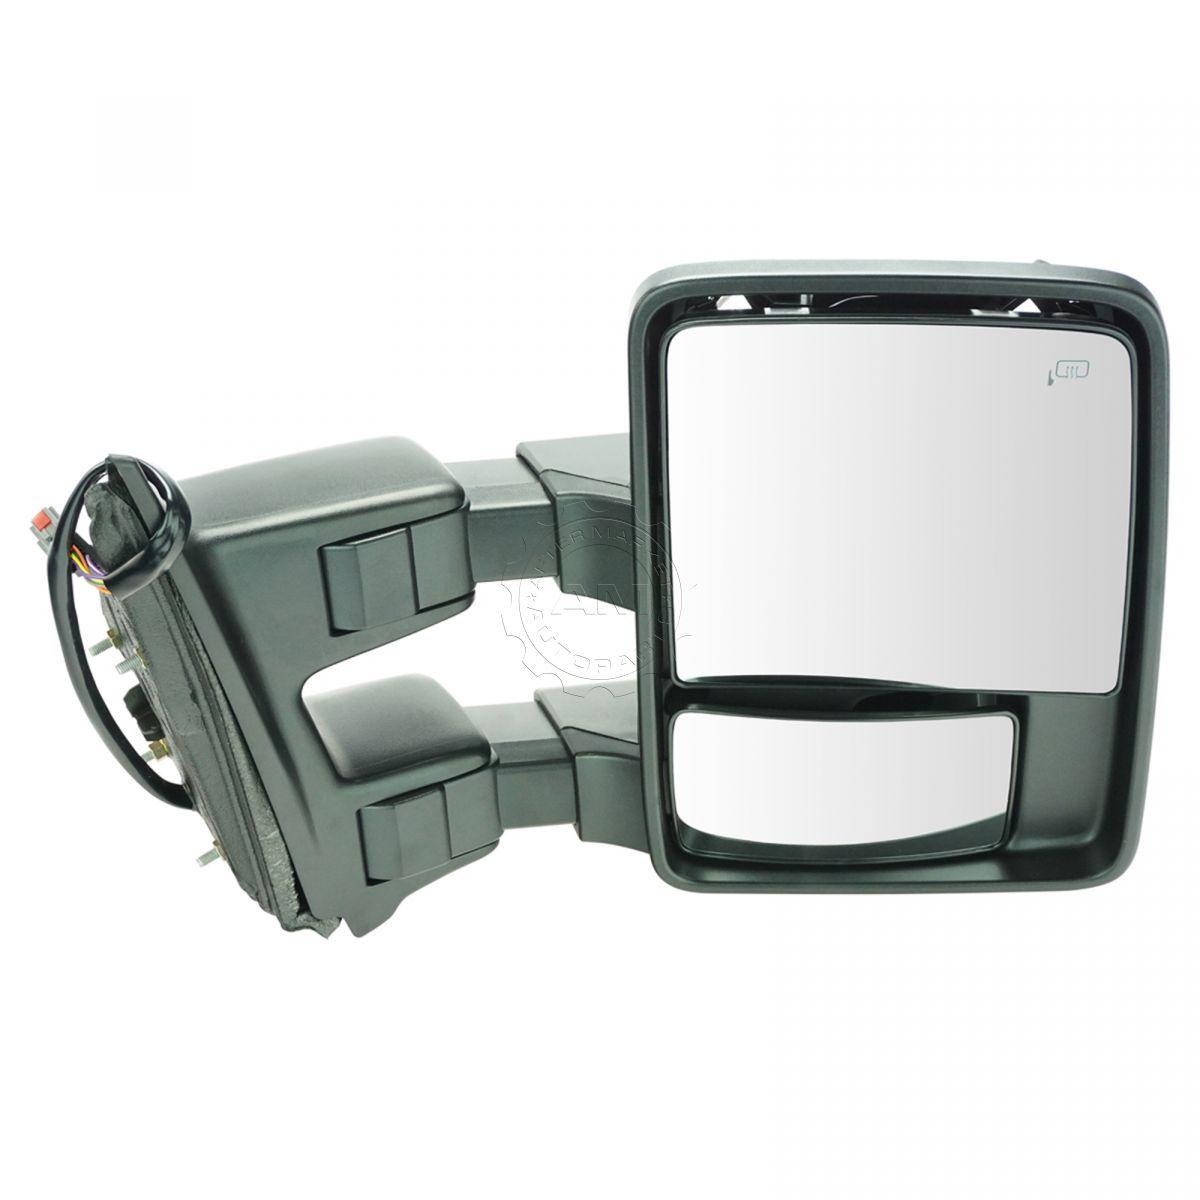 Towing Mirror Heat Signal Power Folding Telescoping Right RH for Super Duty